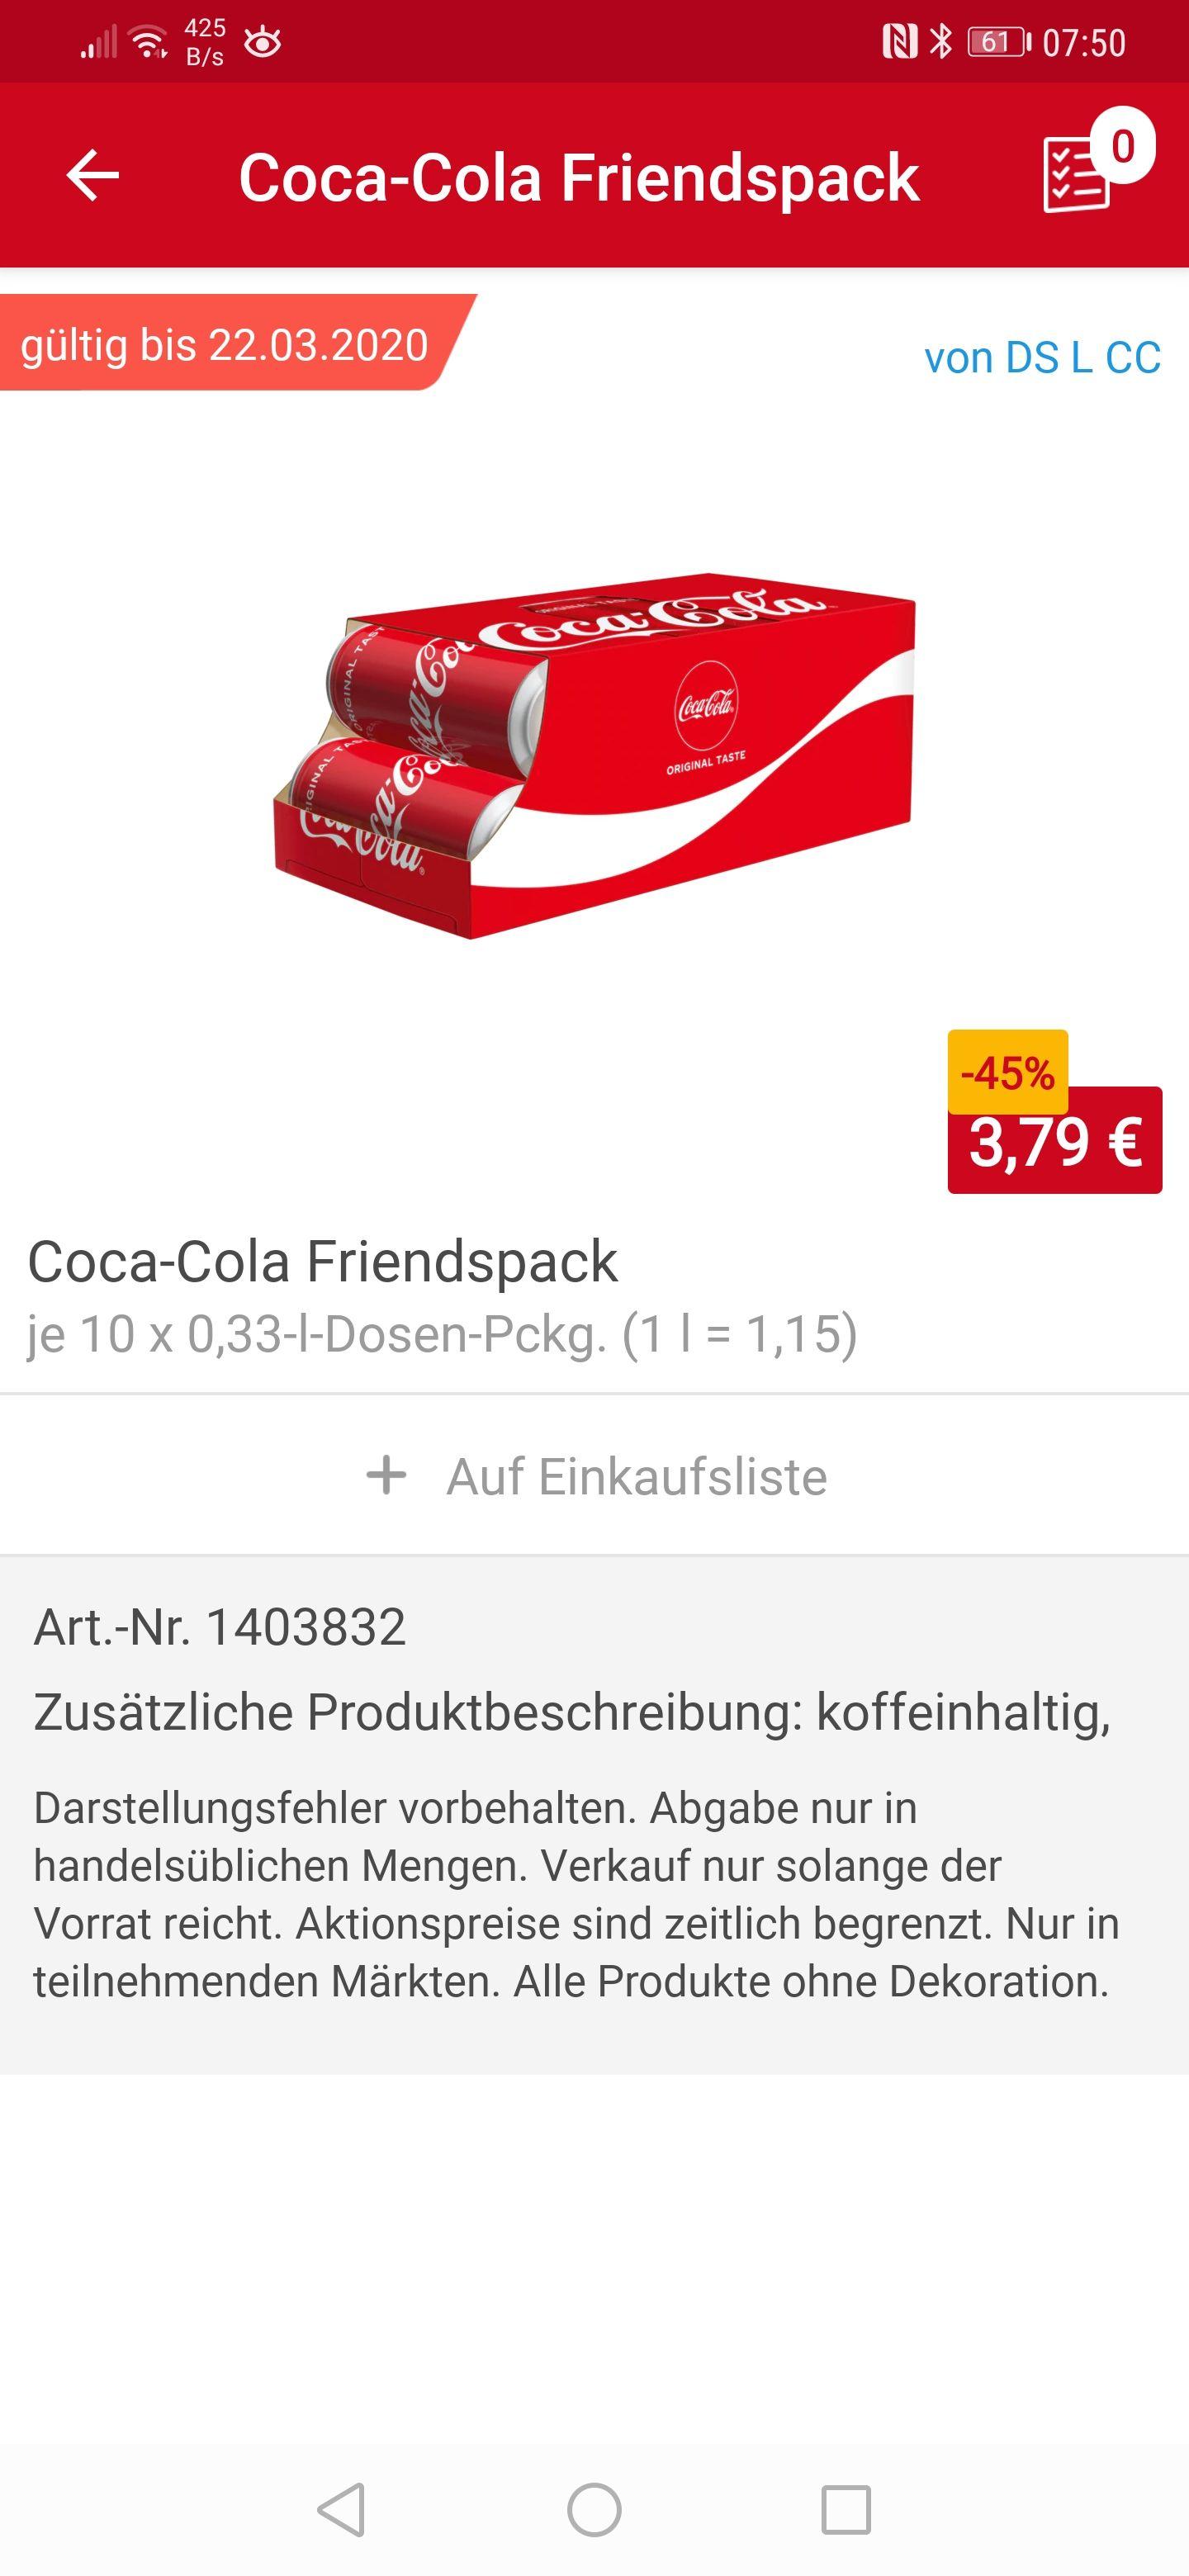 Rewe Lokal 03149 Coca Cola Friendspack, 10 x 0.33 Liter Dose